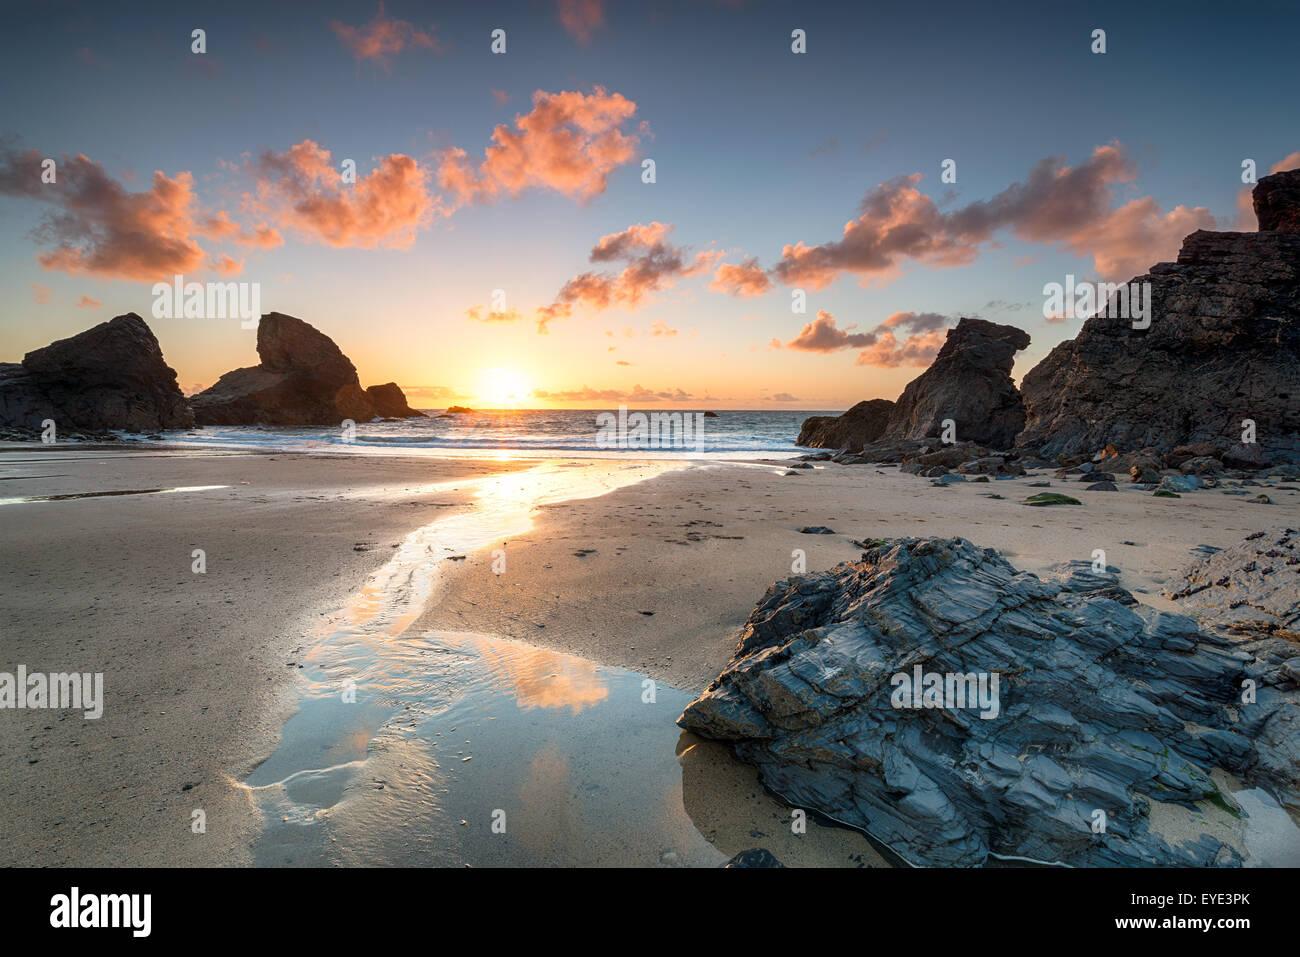 Sonnenuntergang an der Porthcothan Bucht an der Nordküste von Cornwall Stockbild